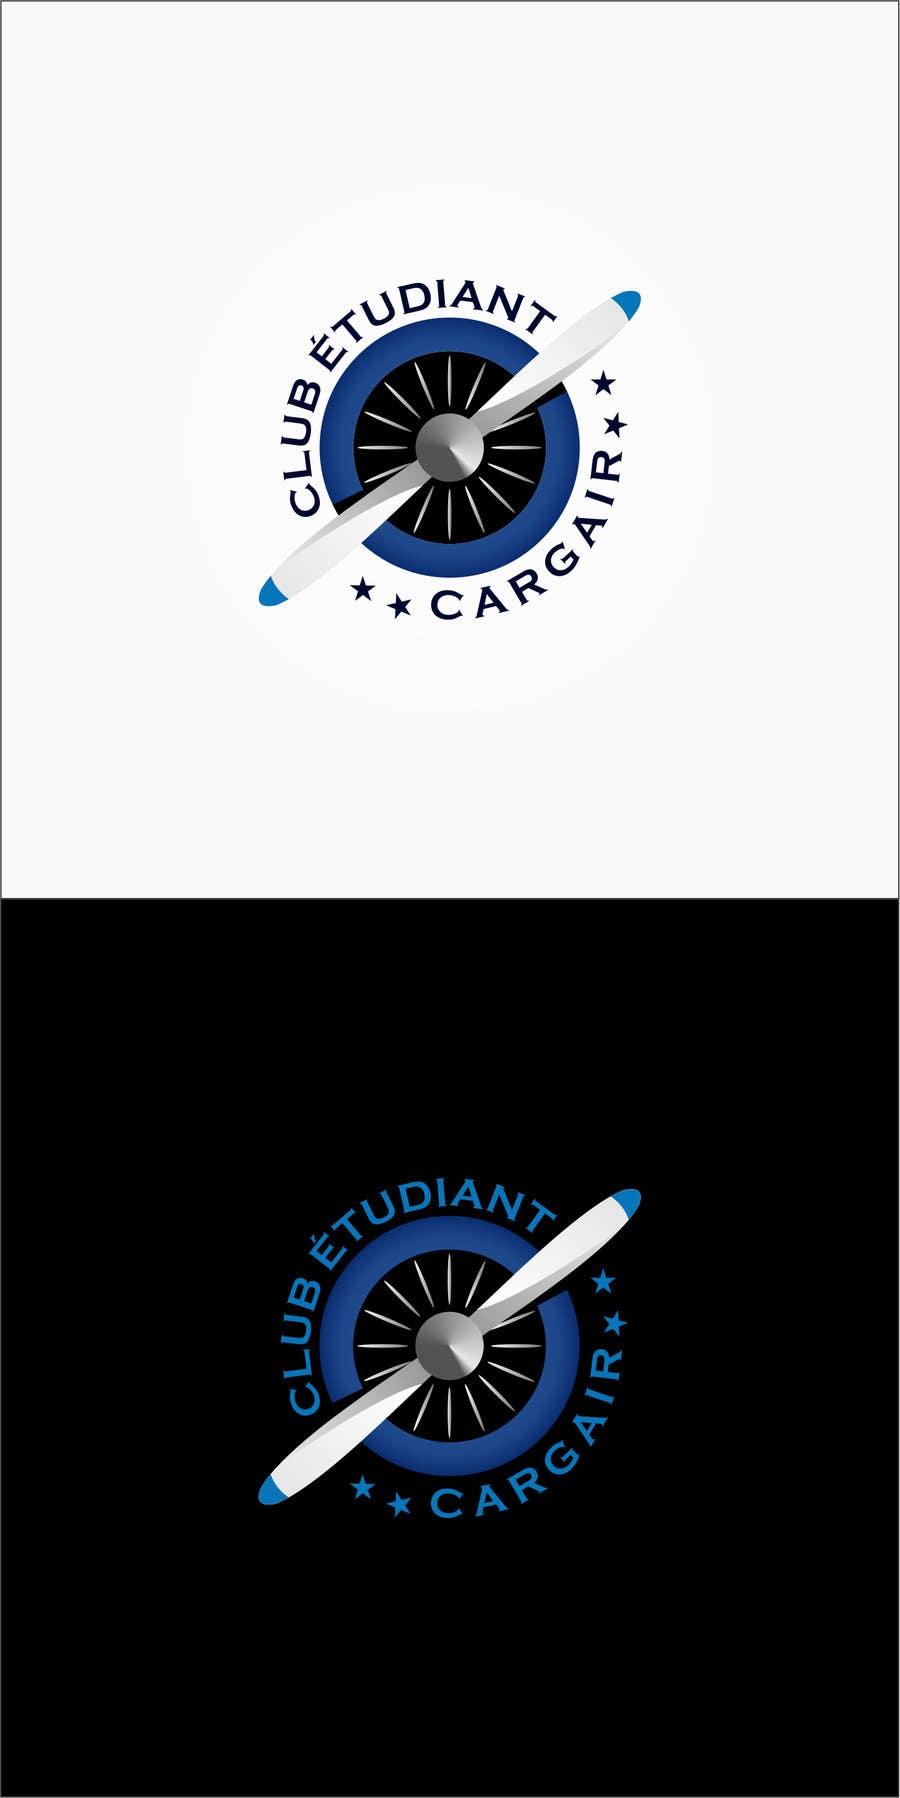 Proposition n°89 du concours Design a Logo flying school student club